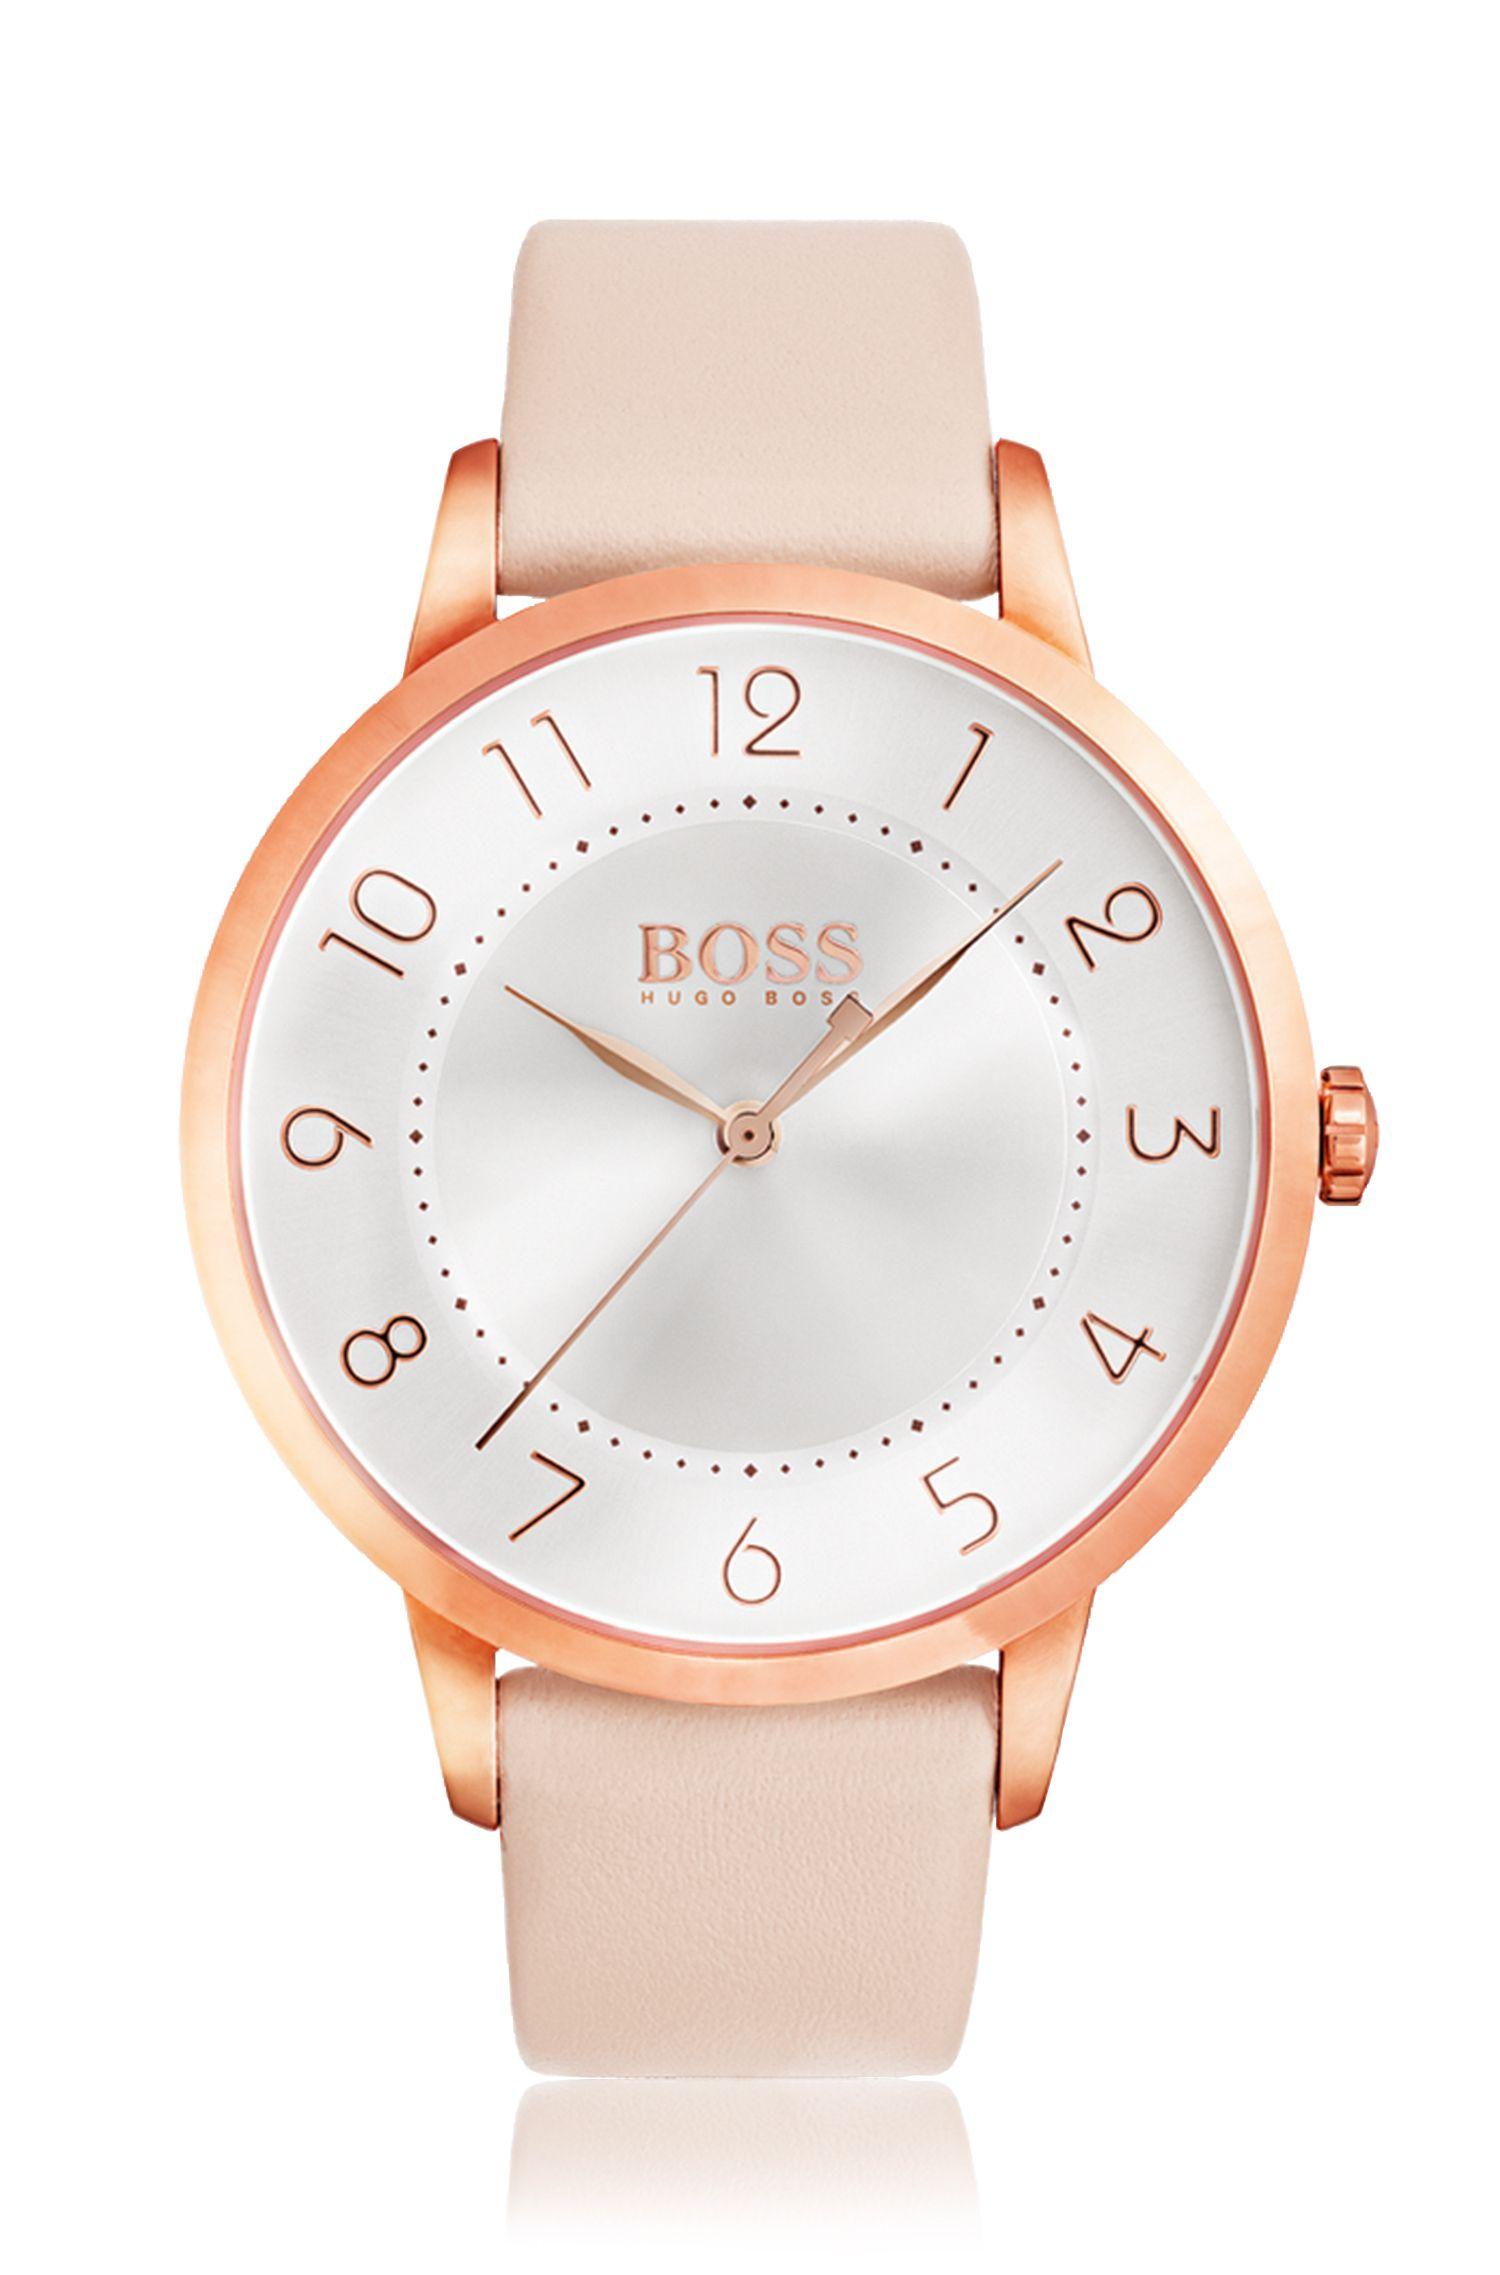 Horloge van roségoudkleurig staal met drie wijzers